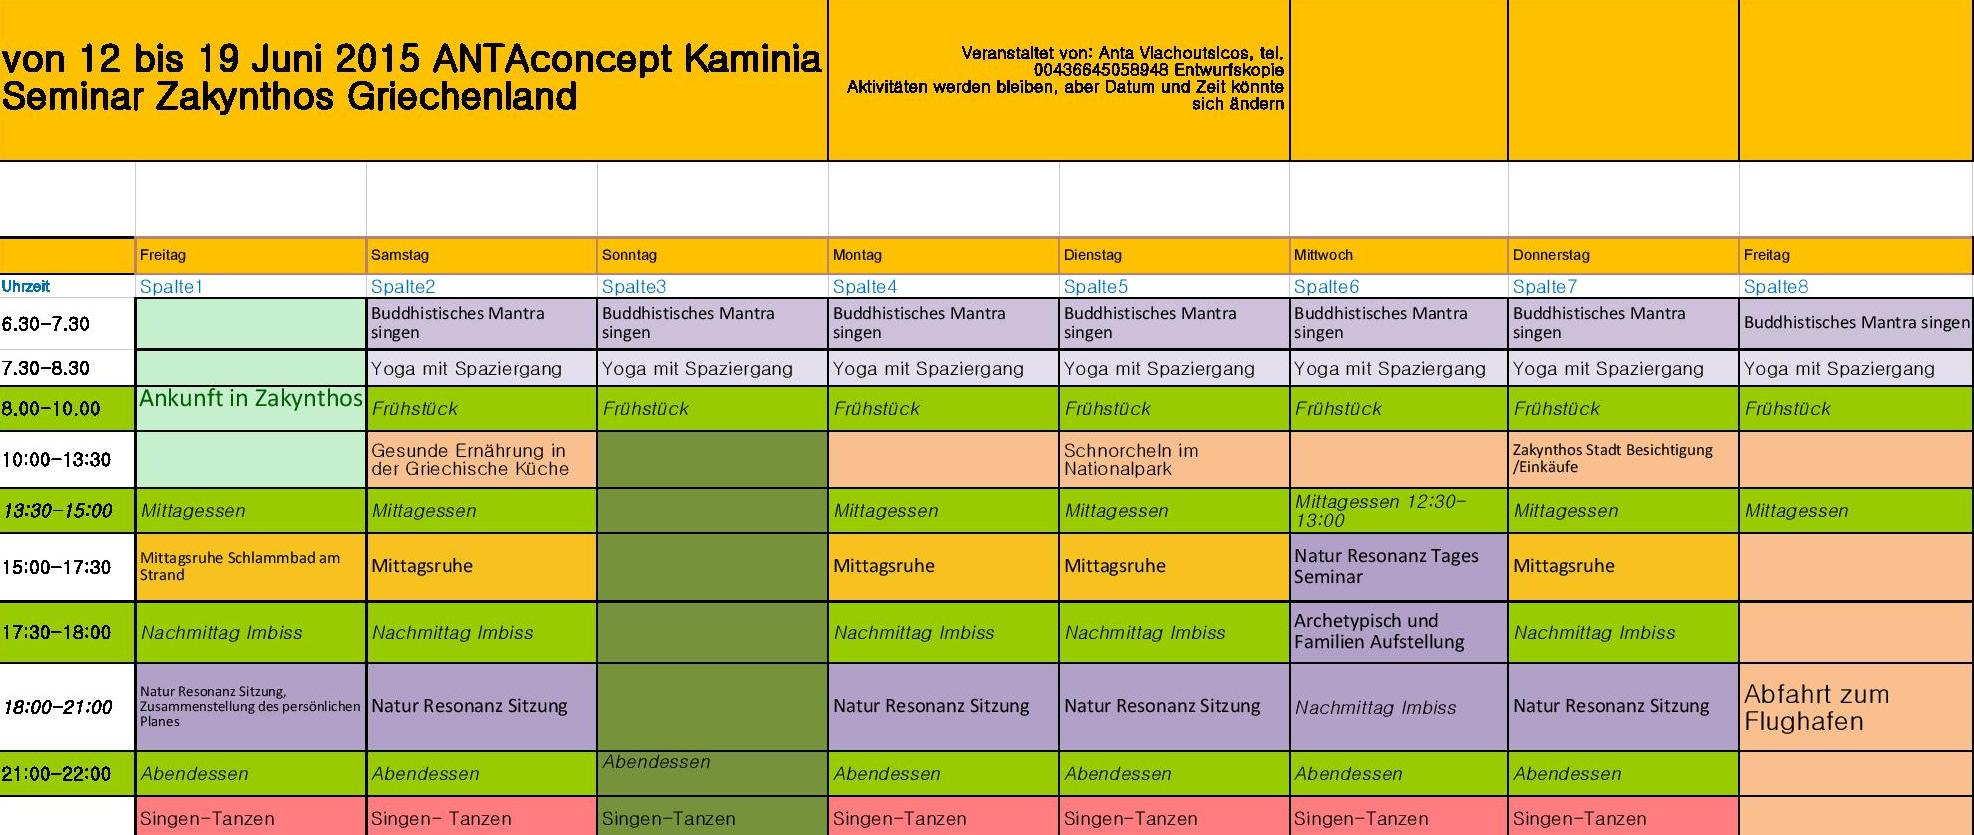 ANTAconsept kaminia seminar 2015 - Zeitplan-page-001 (1)